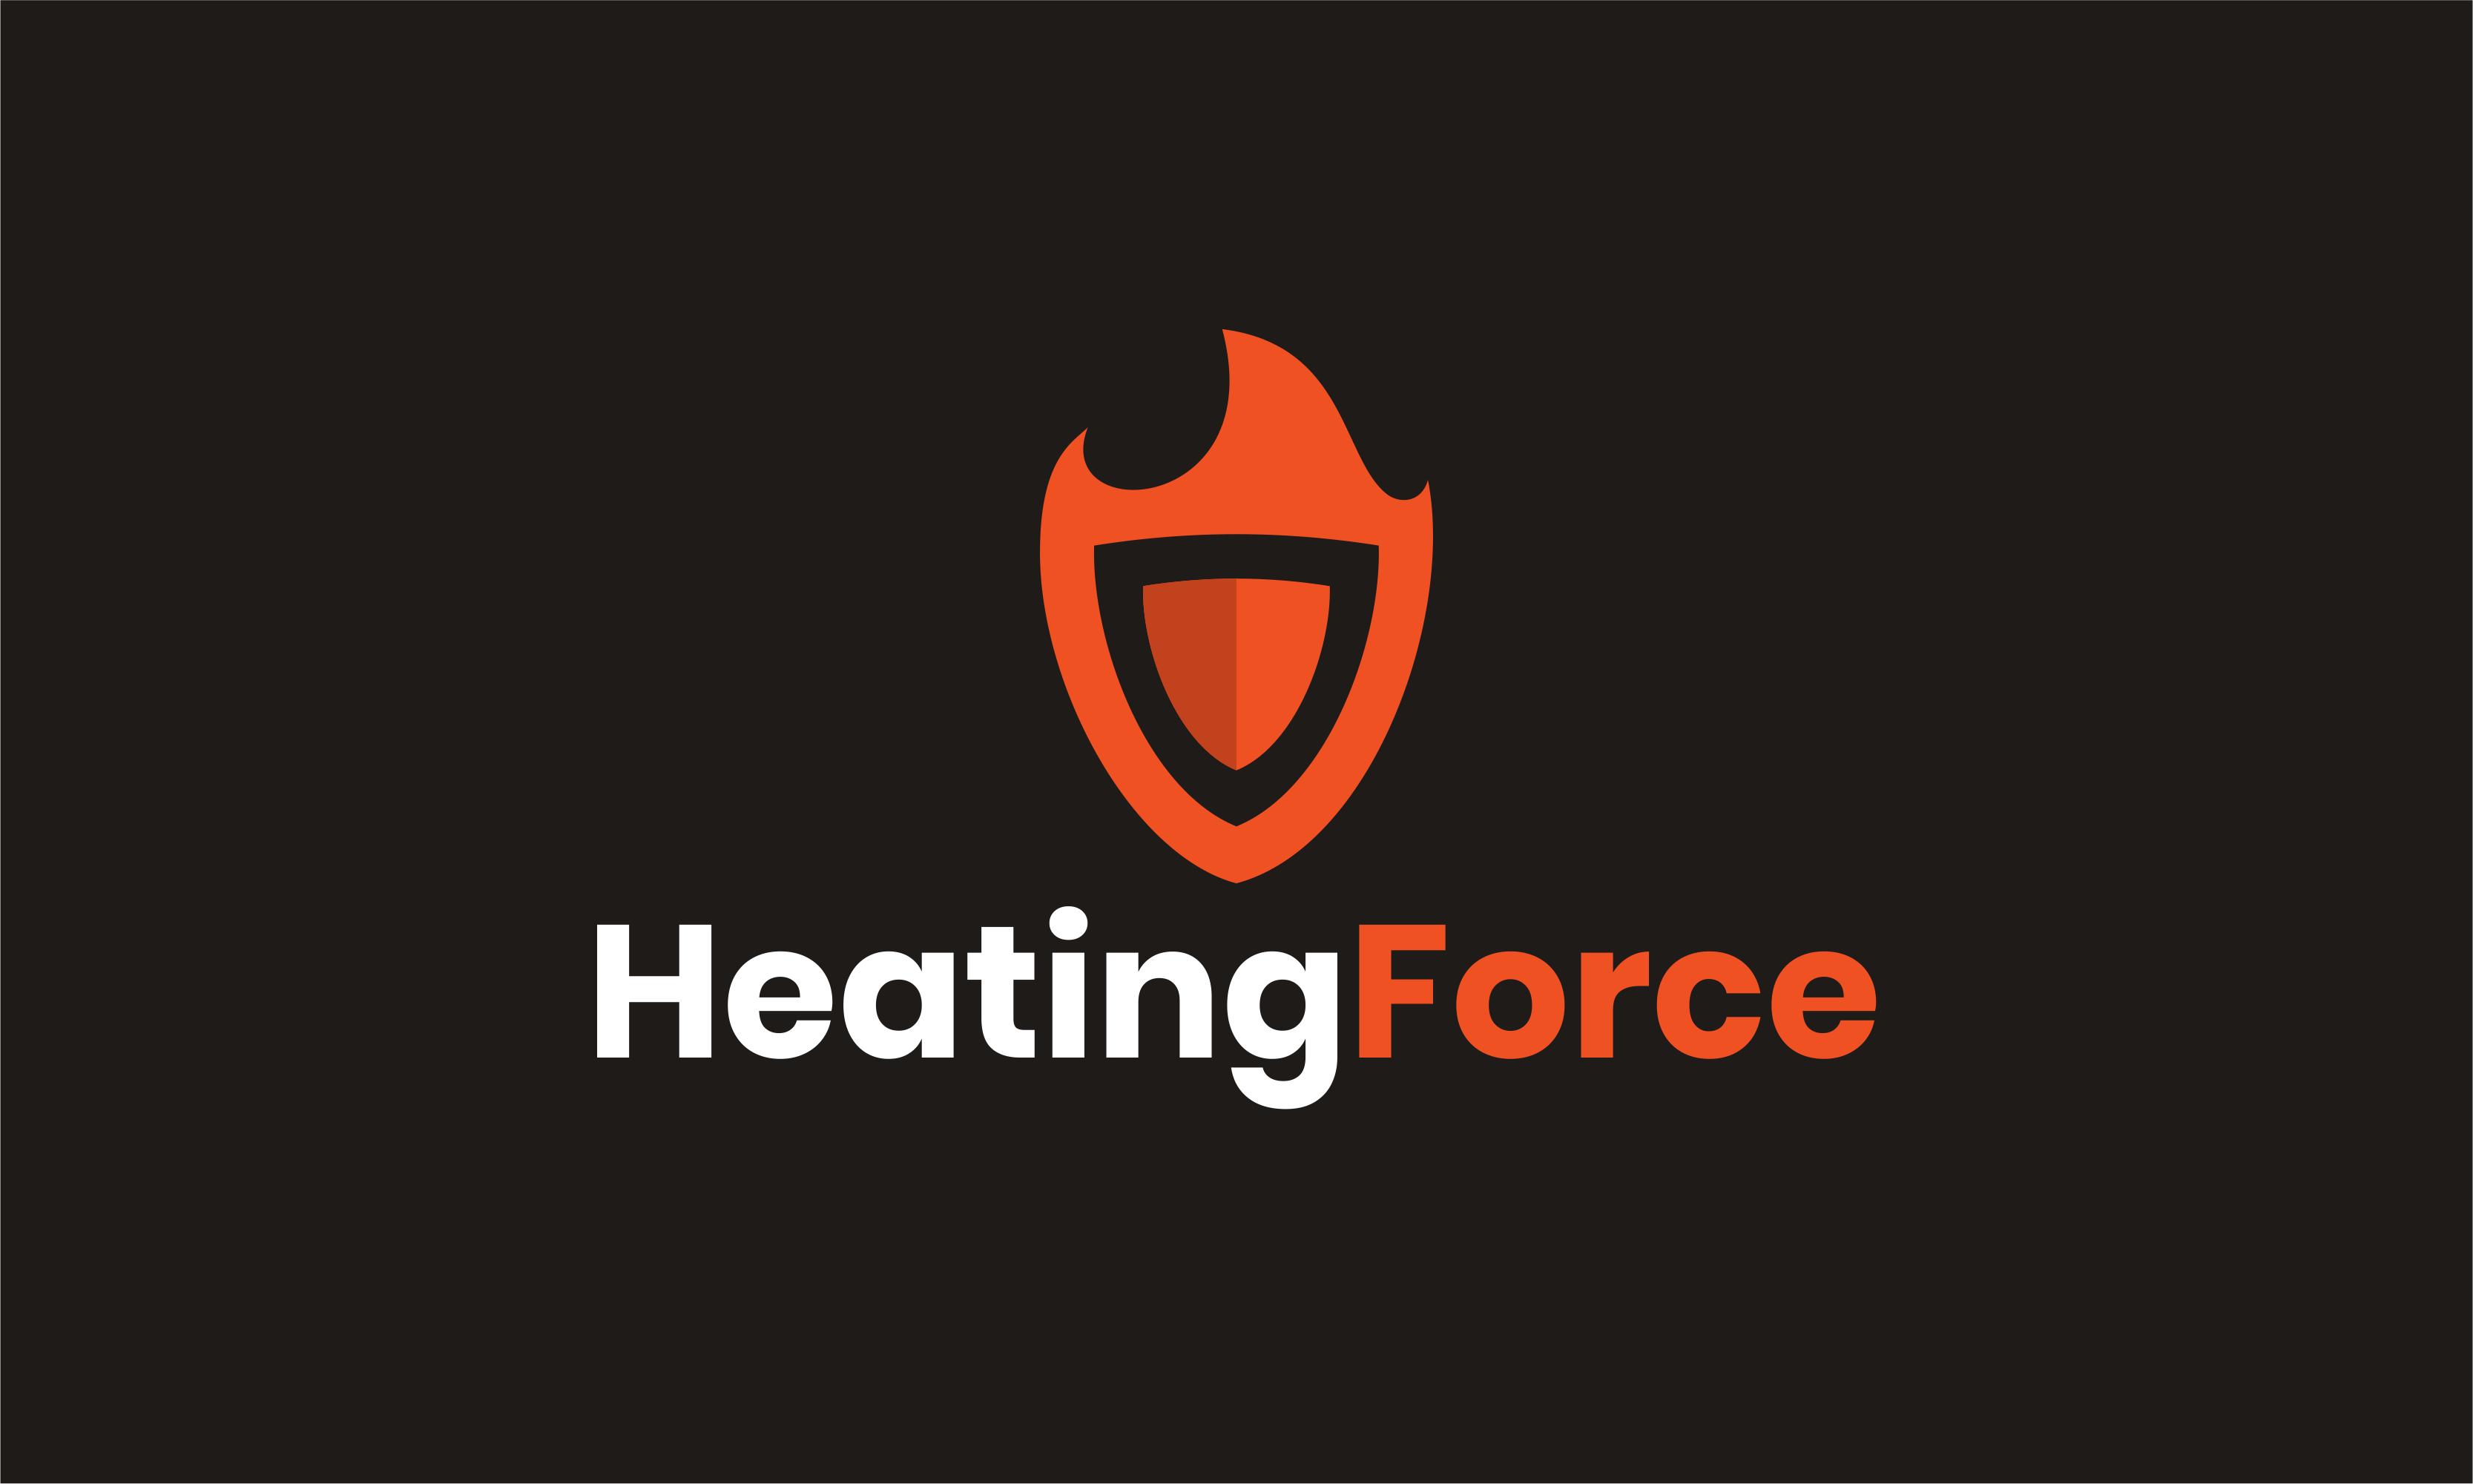 HeatingForce logo